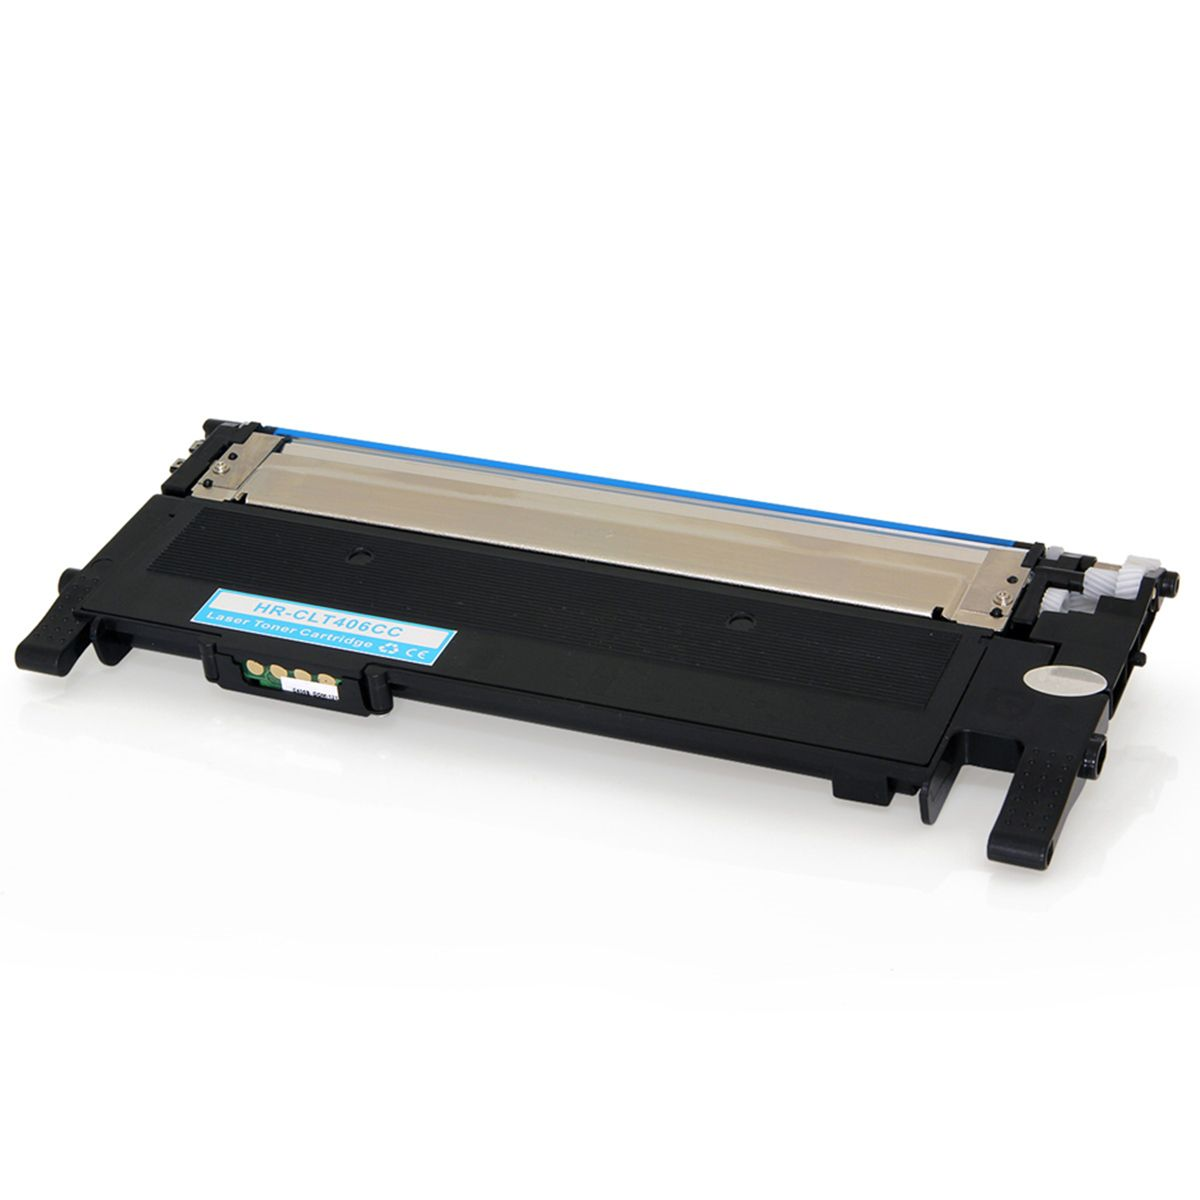 Toner Compatível Samsung CLT-Y409S Ciano Para Clp310 Clp315 Clx3175 Clx 3170n